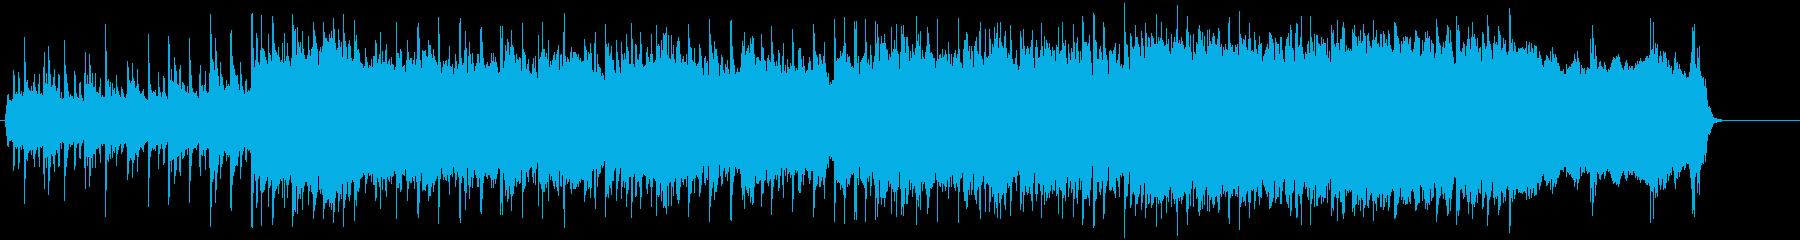 Alternative-Popイン...の再生済みの波形